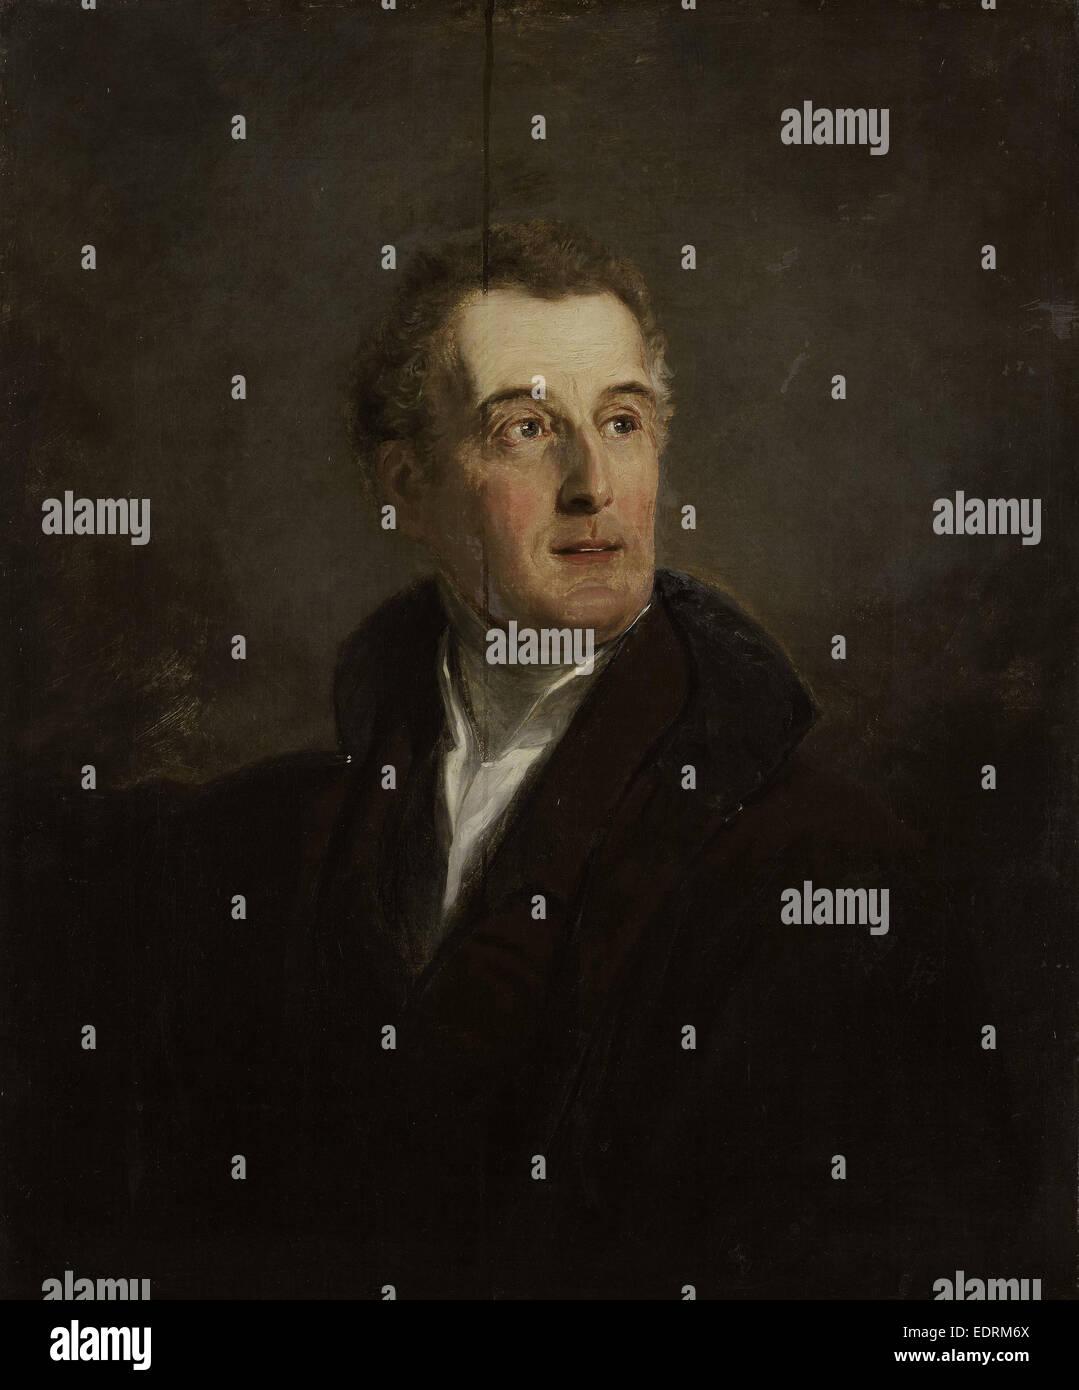 Portrait of Arthur Wellesley, Duke of Wellington, Jan Willem Pieneman, 1821 - Stock Image